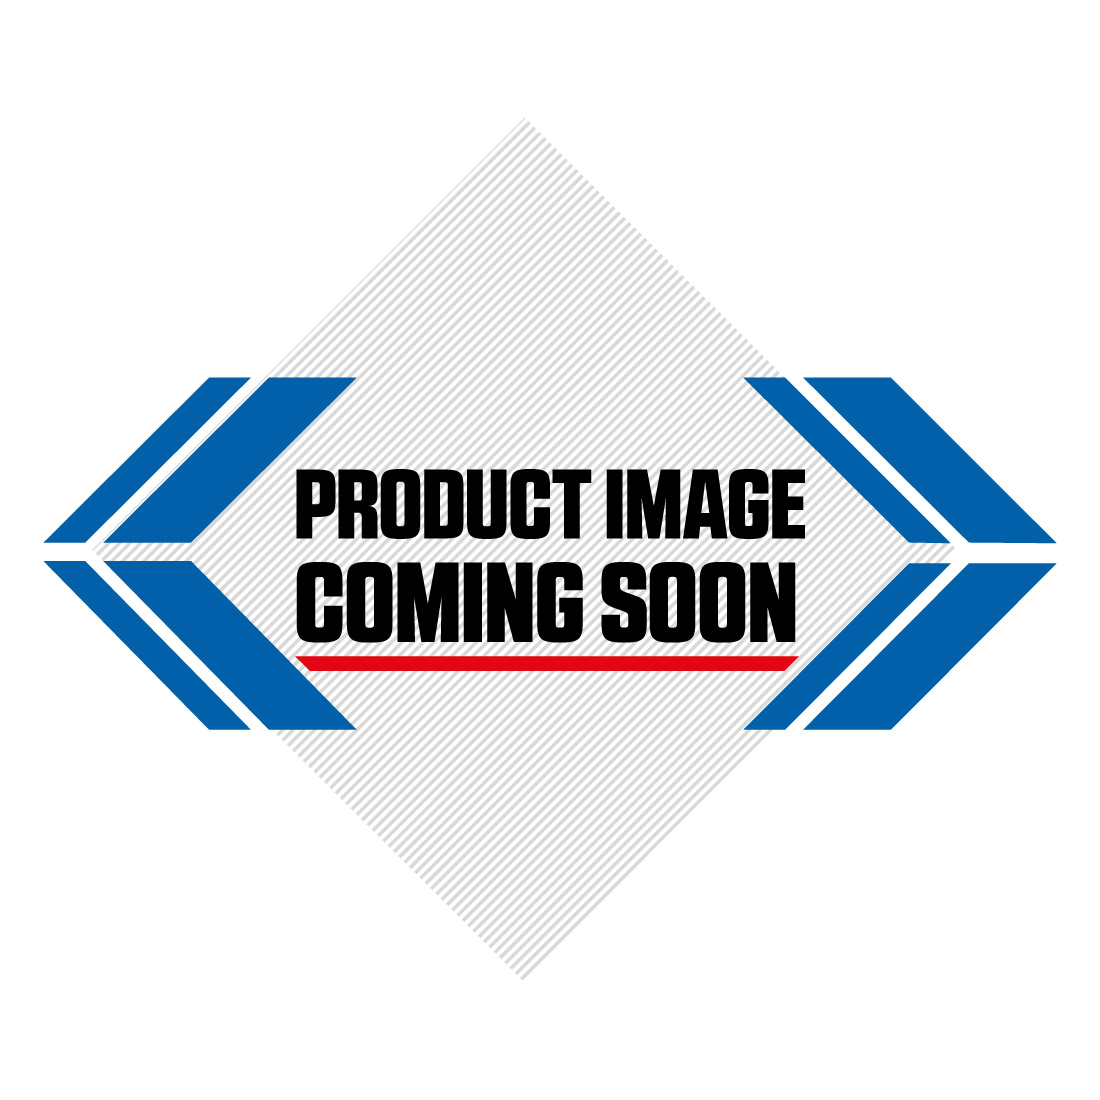 Suzuki Plastic Kit RMZ 450 (2013) OEM Factory Image-2